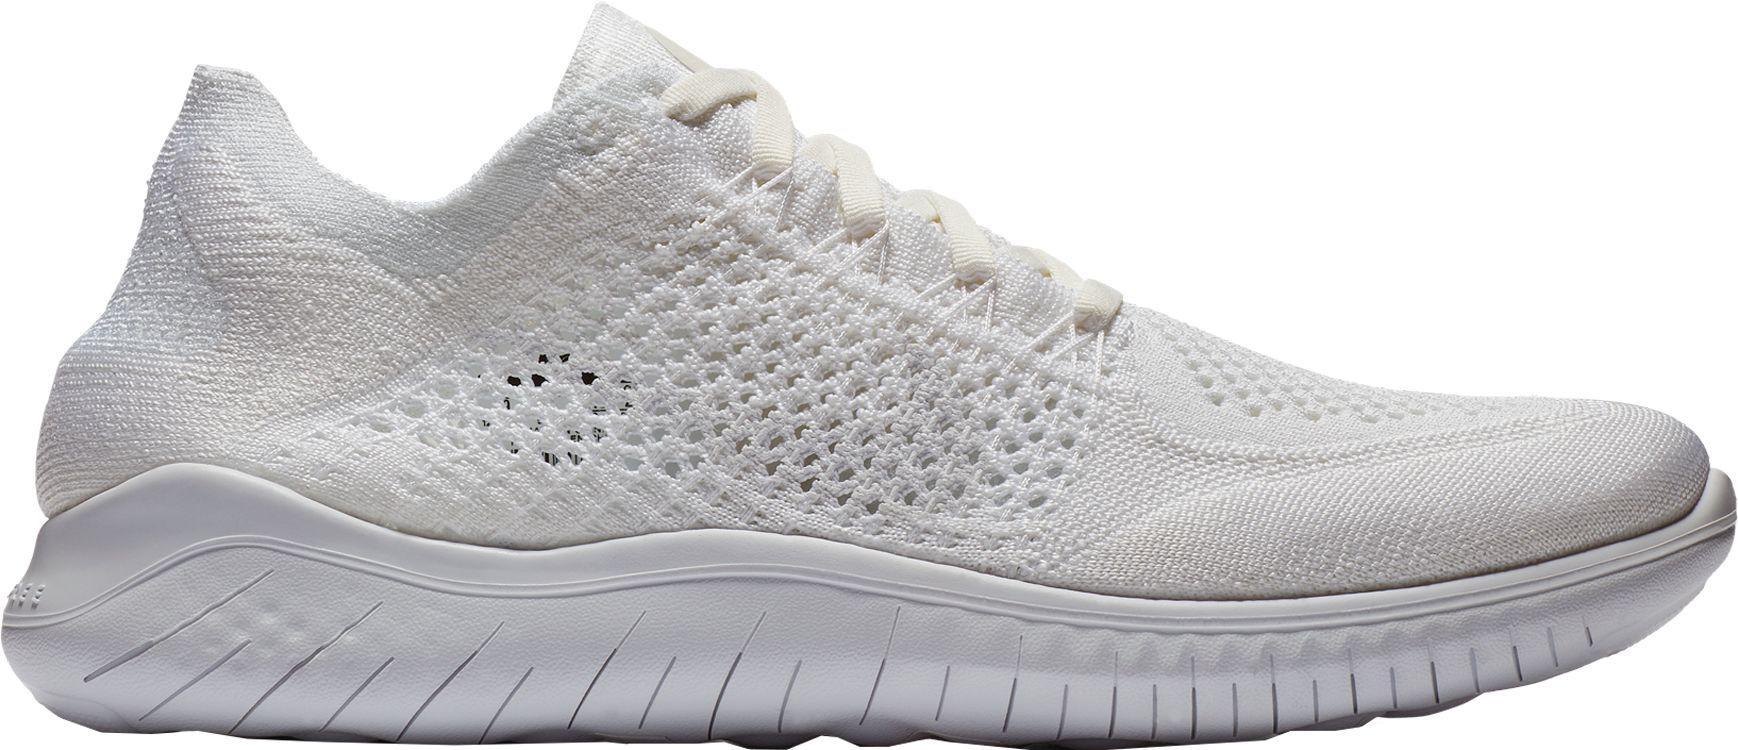 ba1545ffadb5 Lyst - Nike Free Rn Flyknit 2018 Running Shoes in White for Men